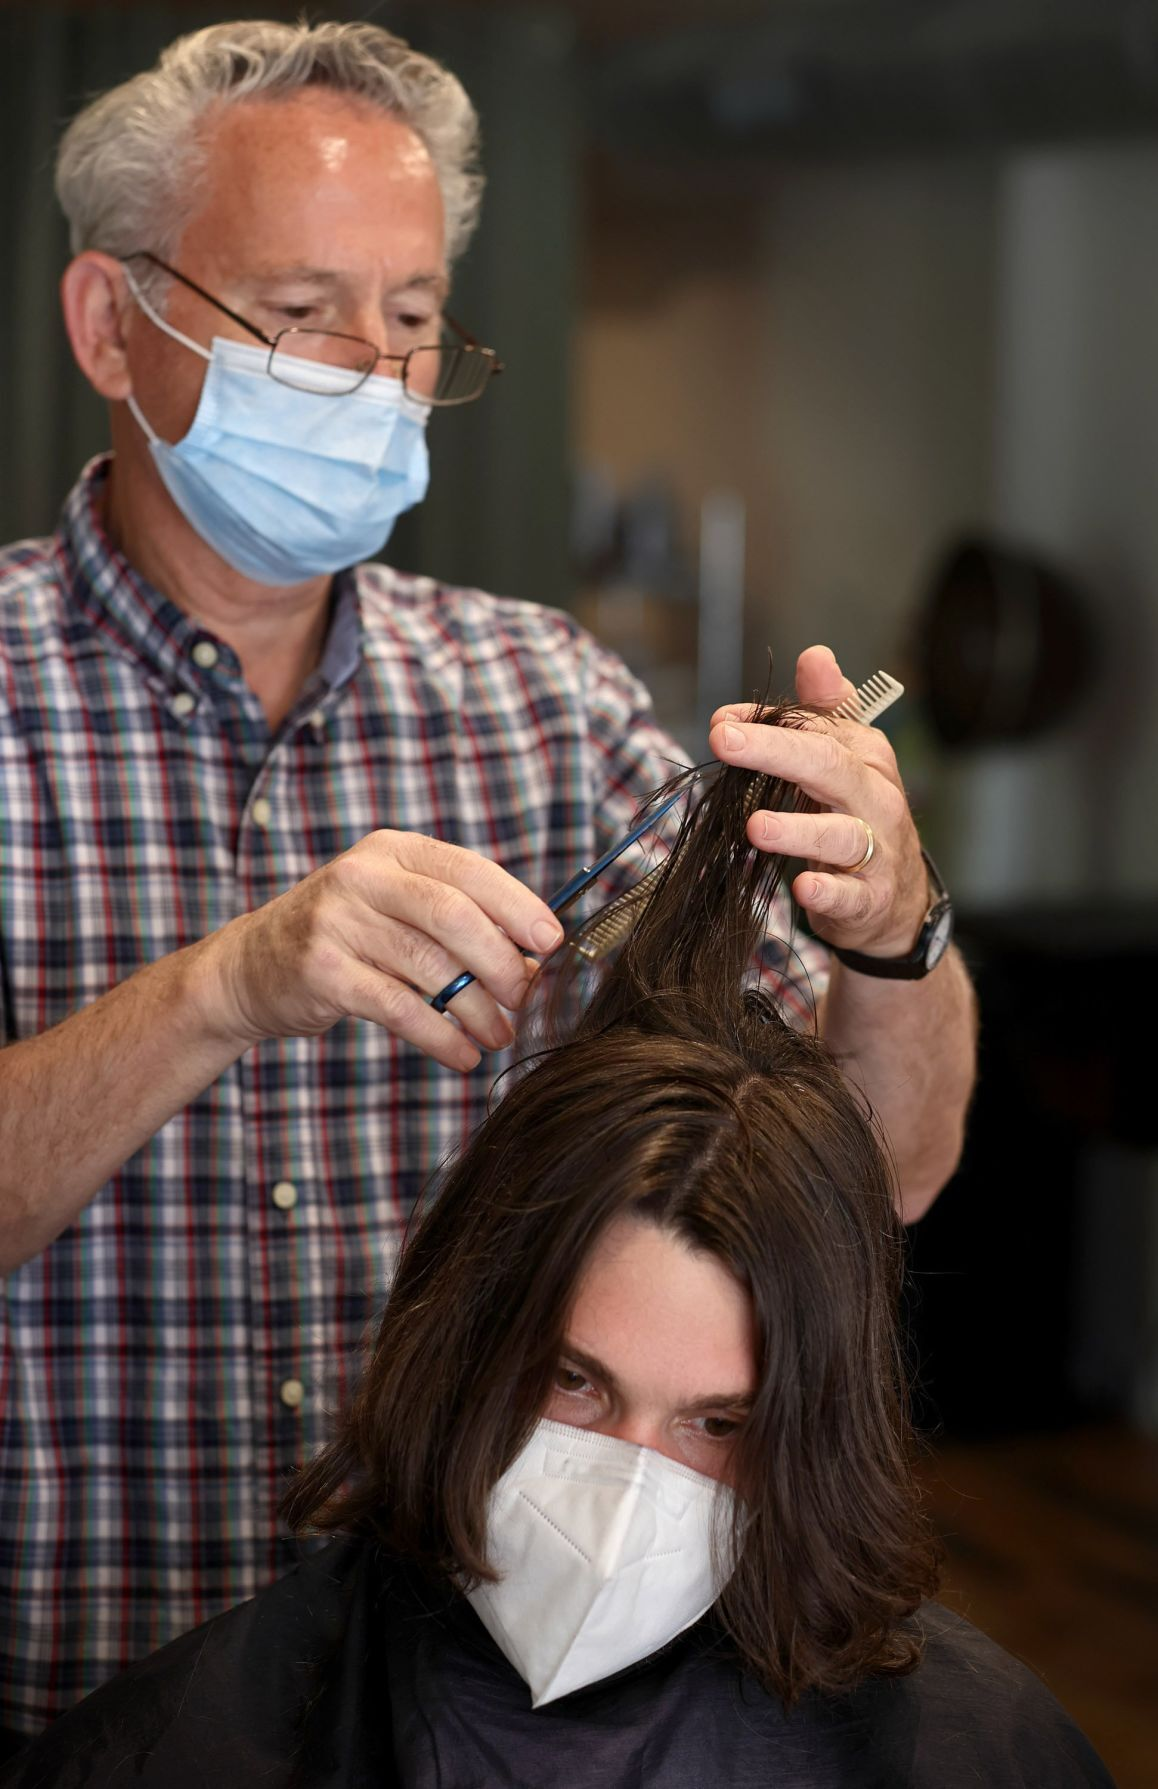 Pandemic hair styles get a trim